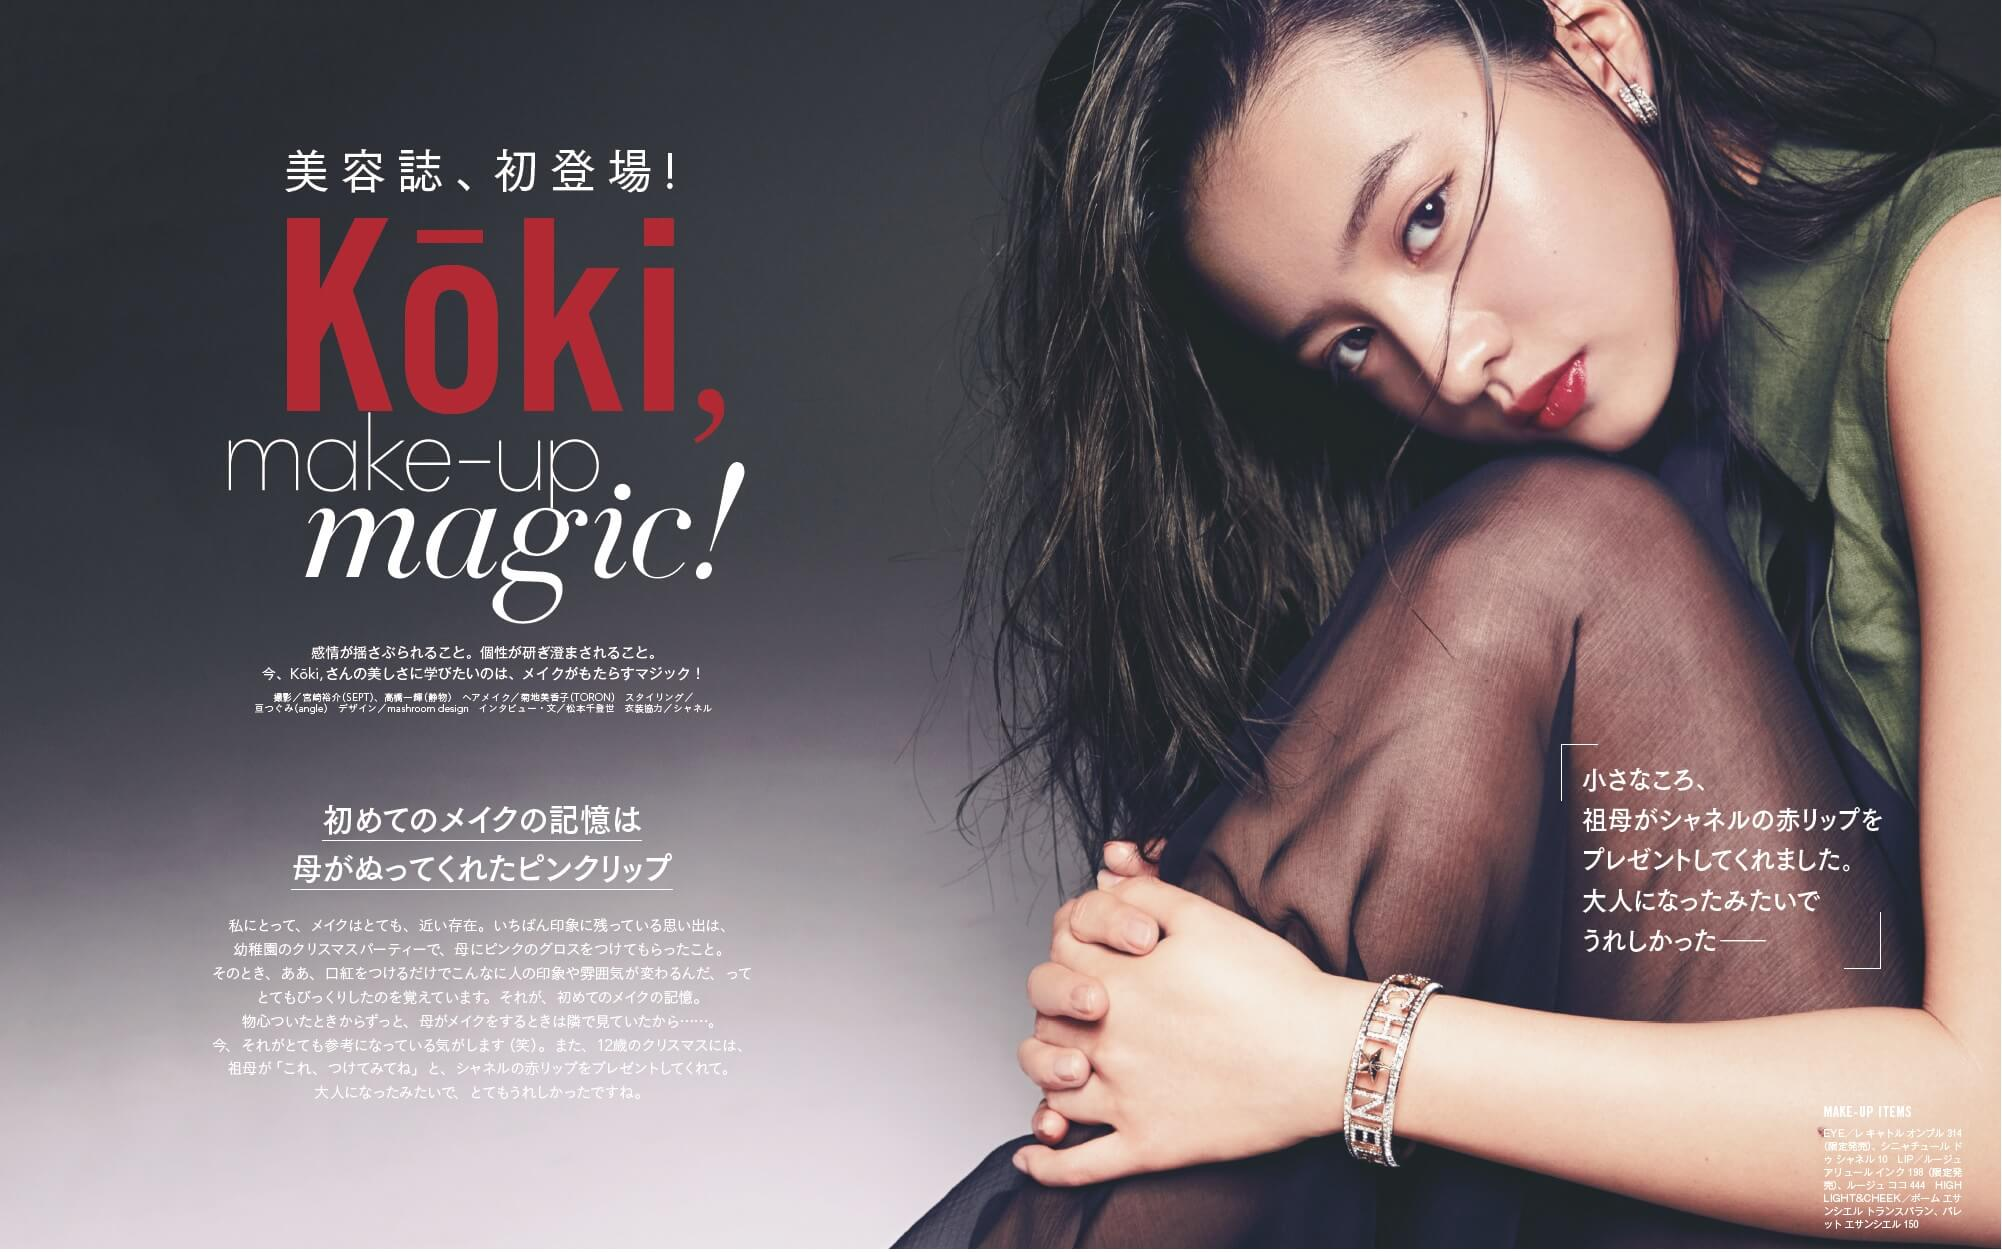 Koki, 憧れるのは芯が強い女性「私の母のように」